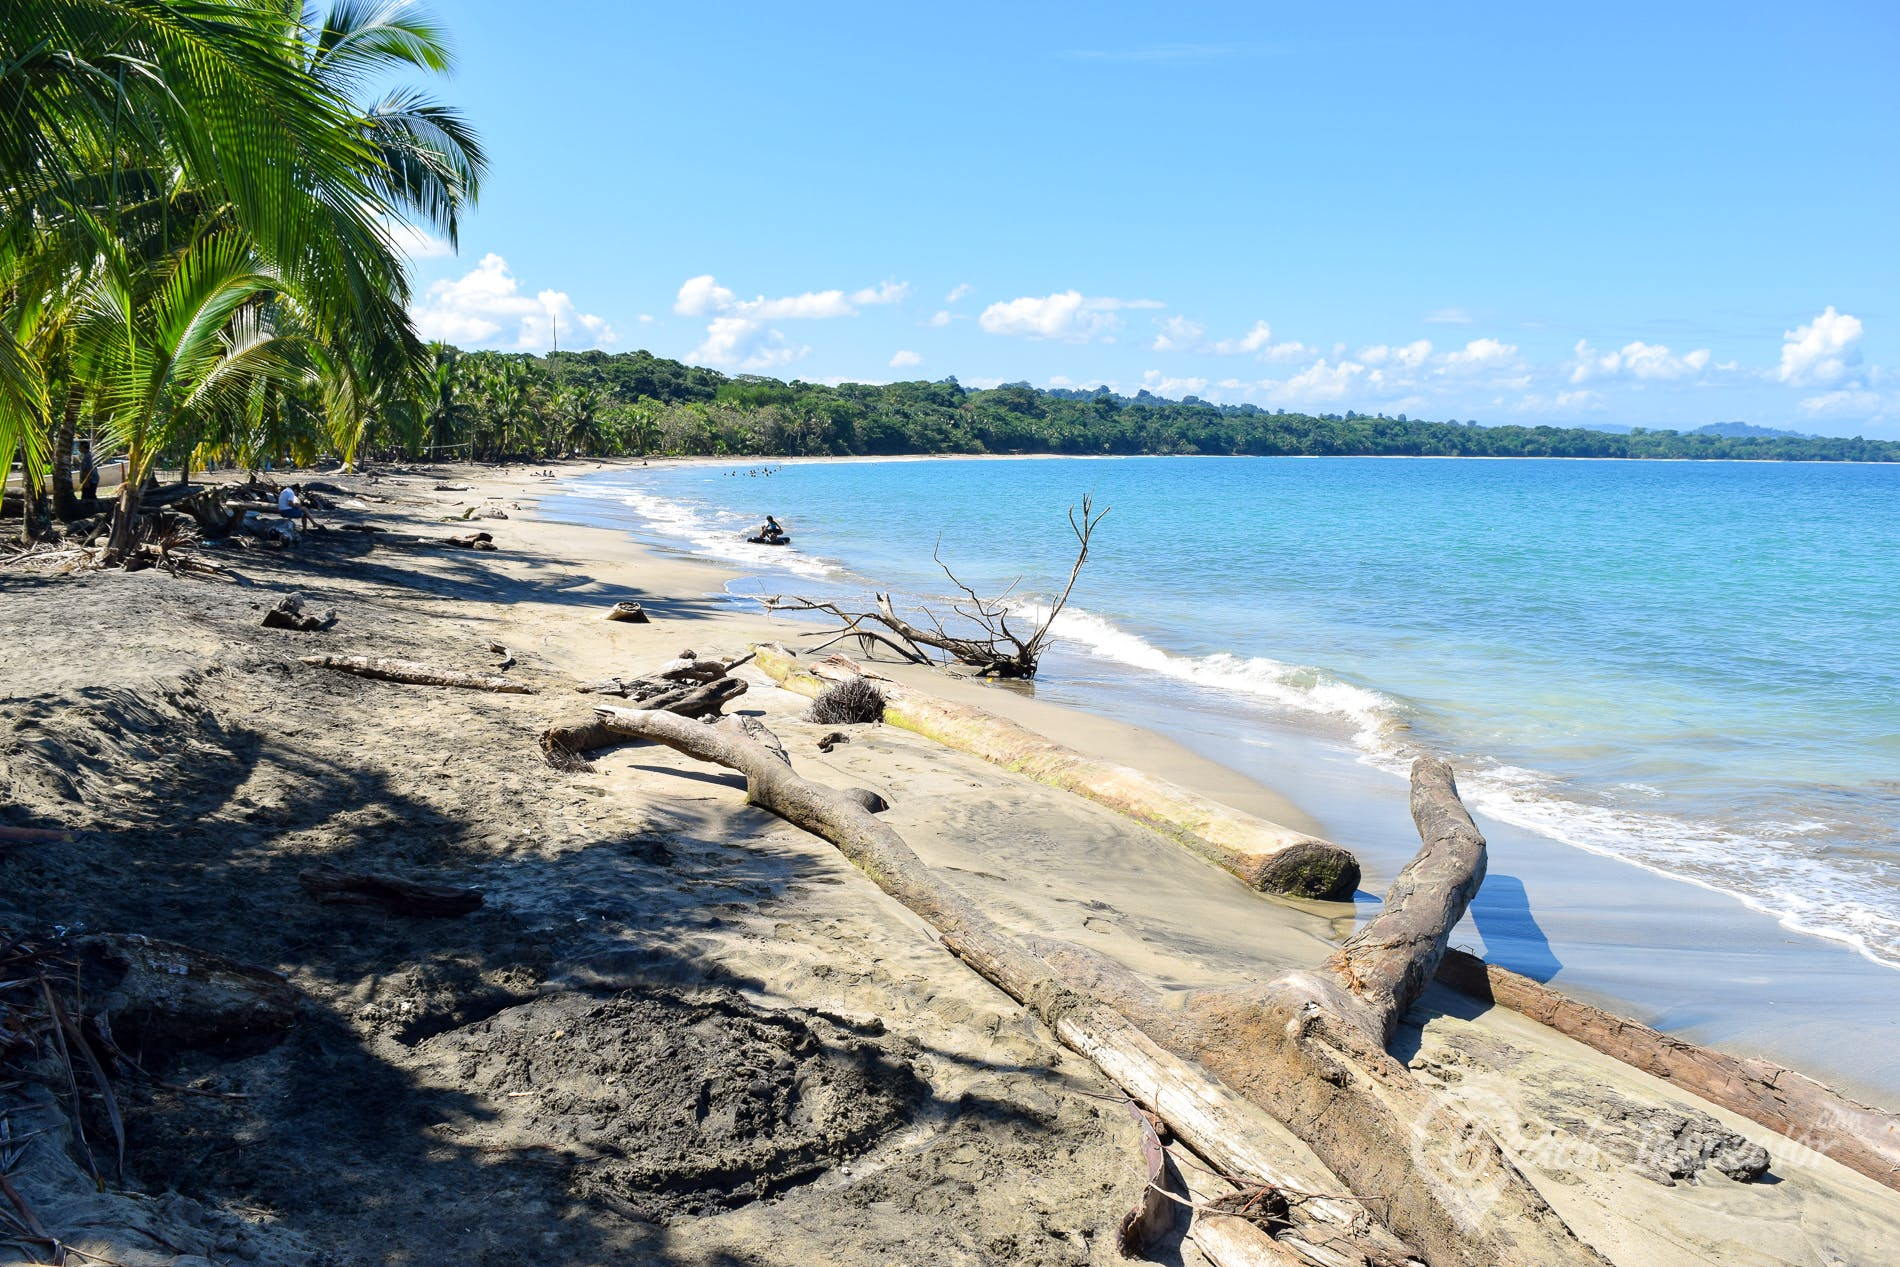 Beach Playa Manzanillo, Costa Rica, Costa Rica